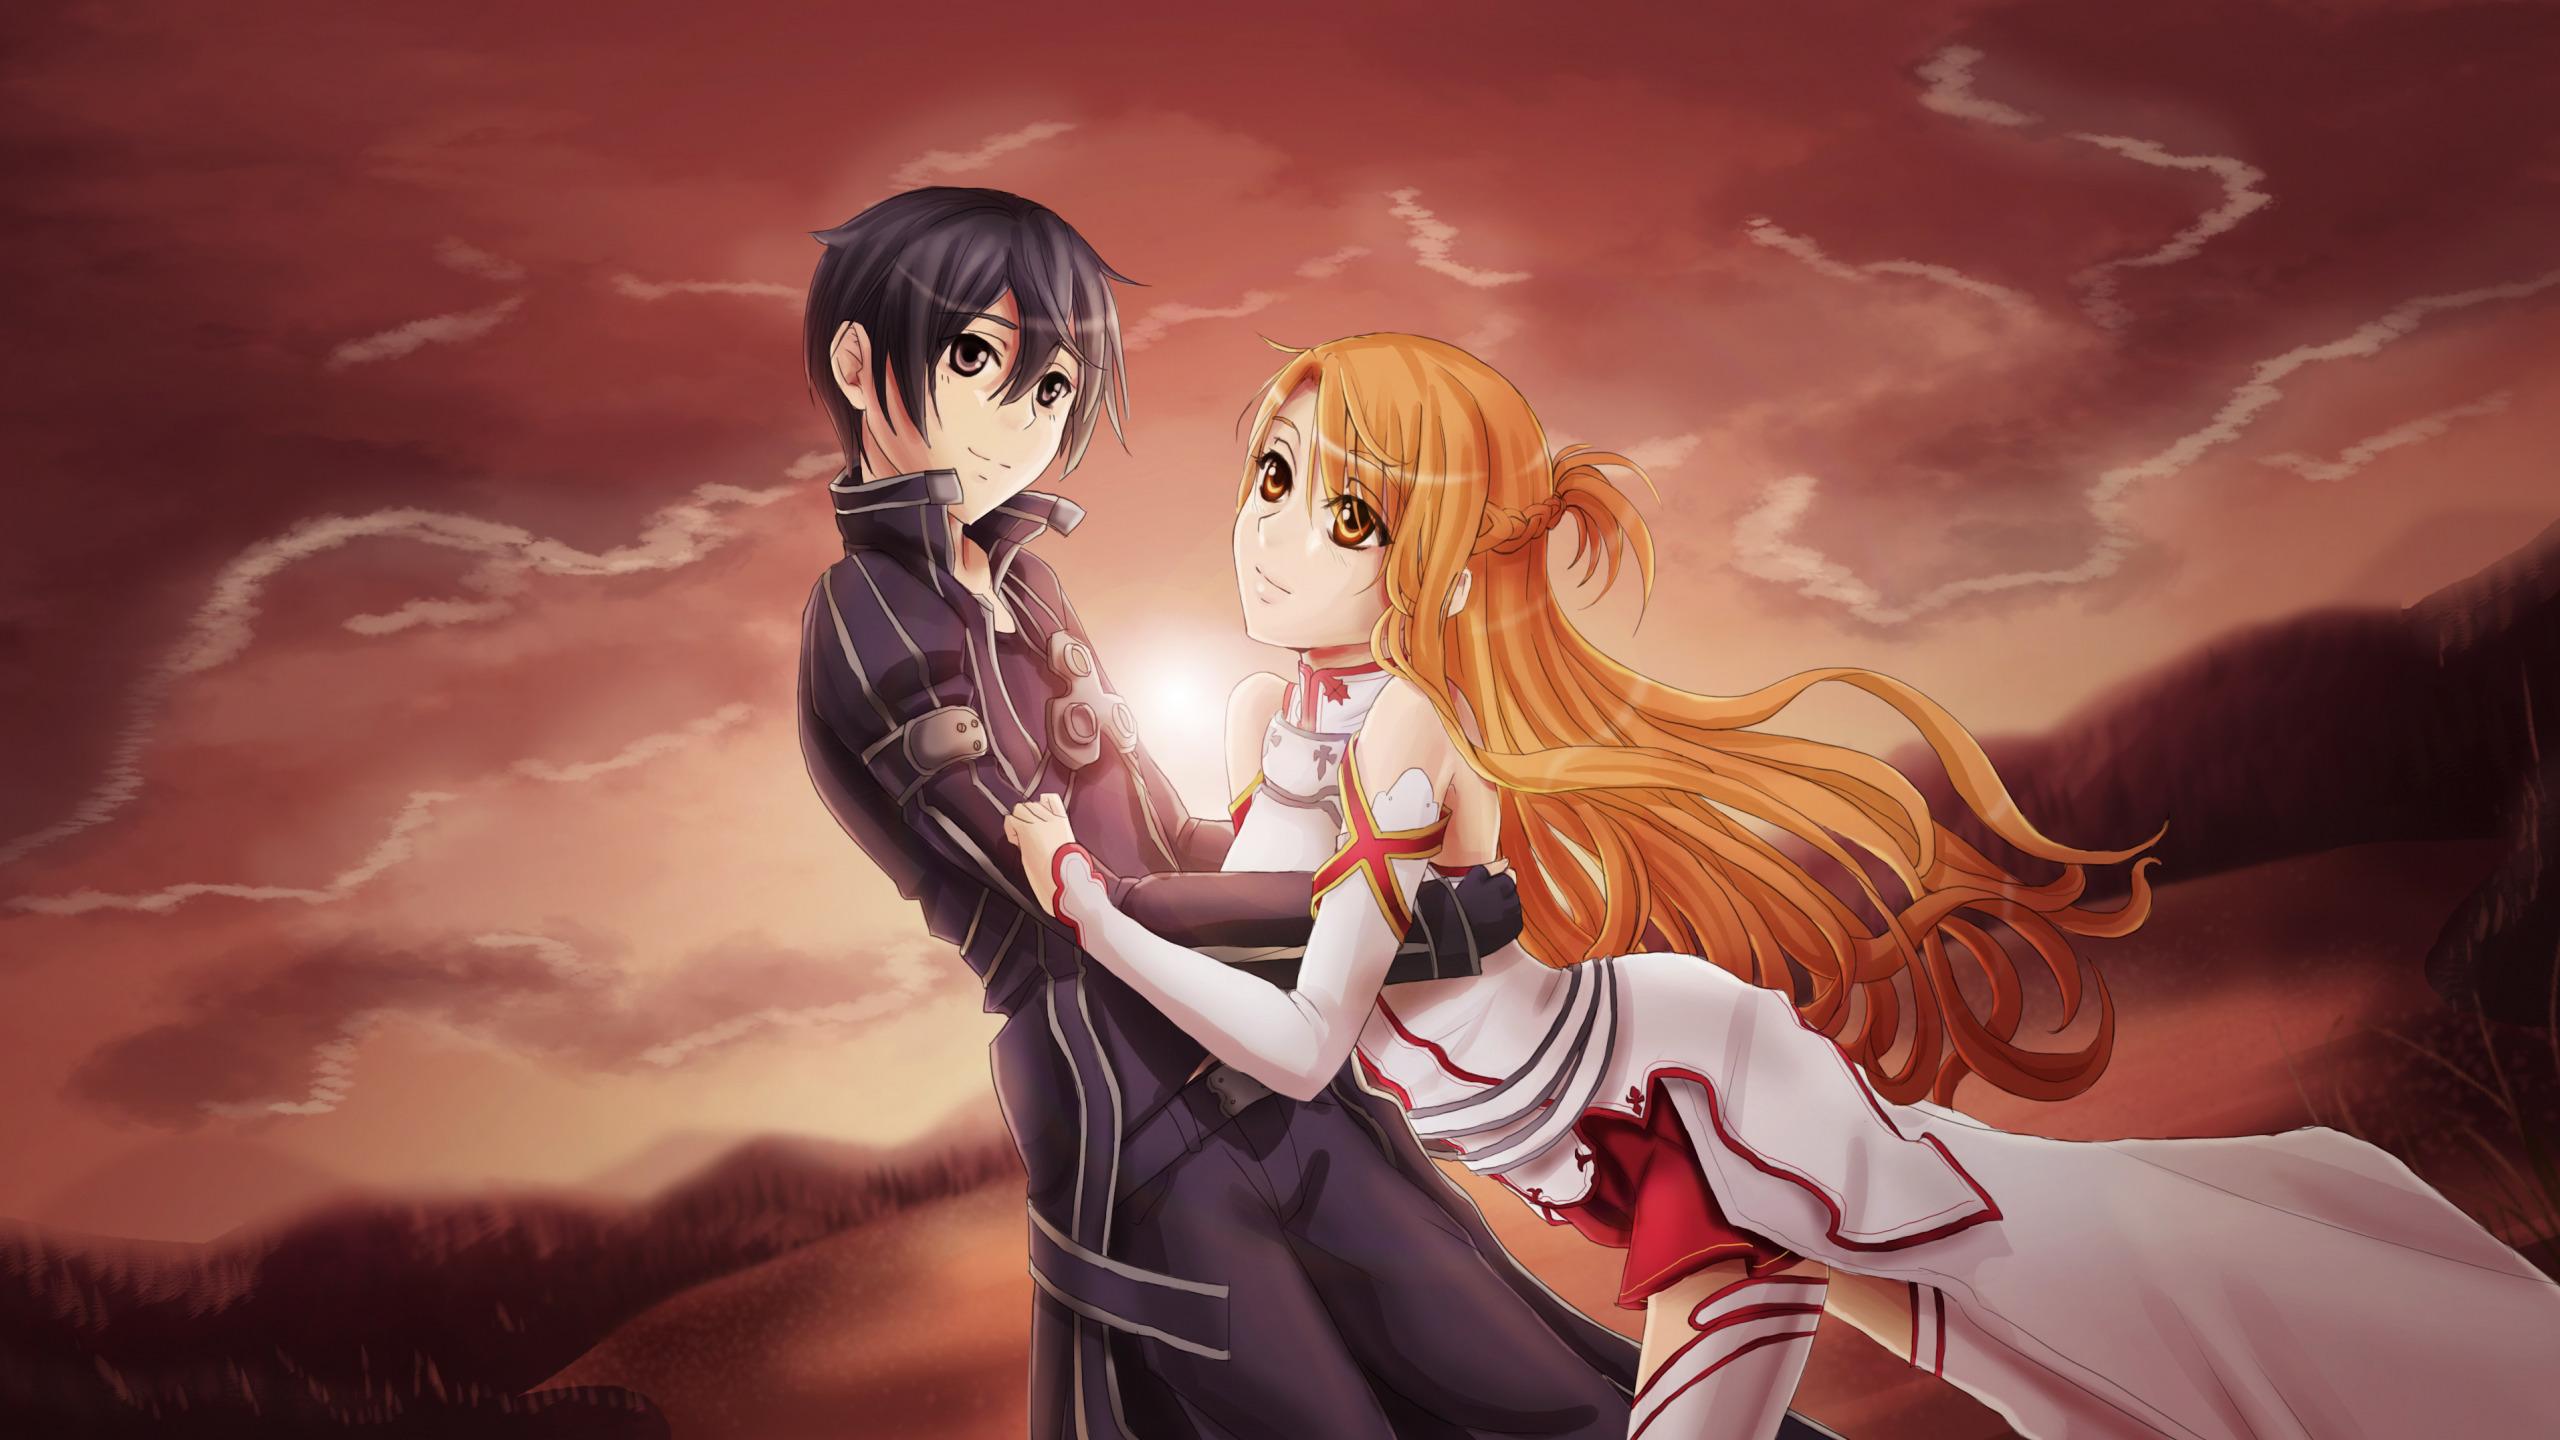 Download Wallpaper Girl Anime Guy Kirito Asuna Sword Art Online Section Shonen In Resolution 2560x1440